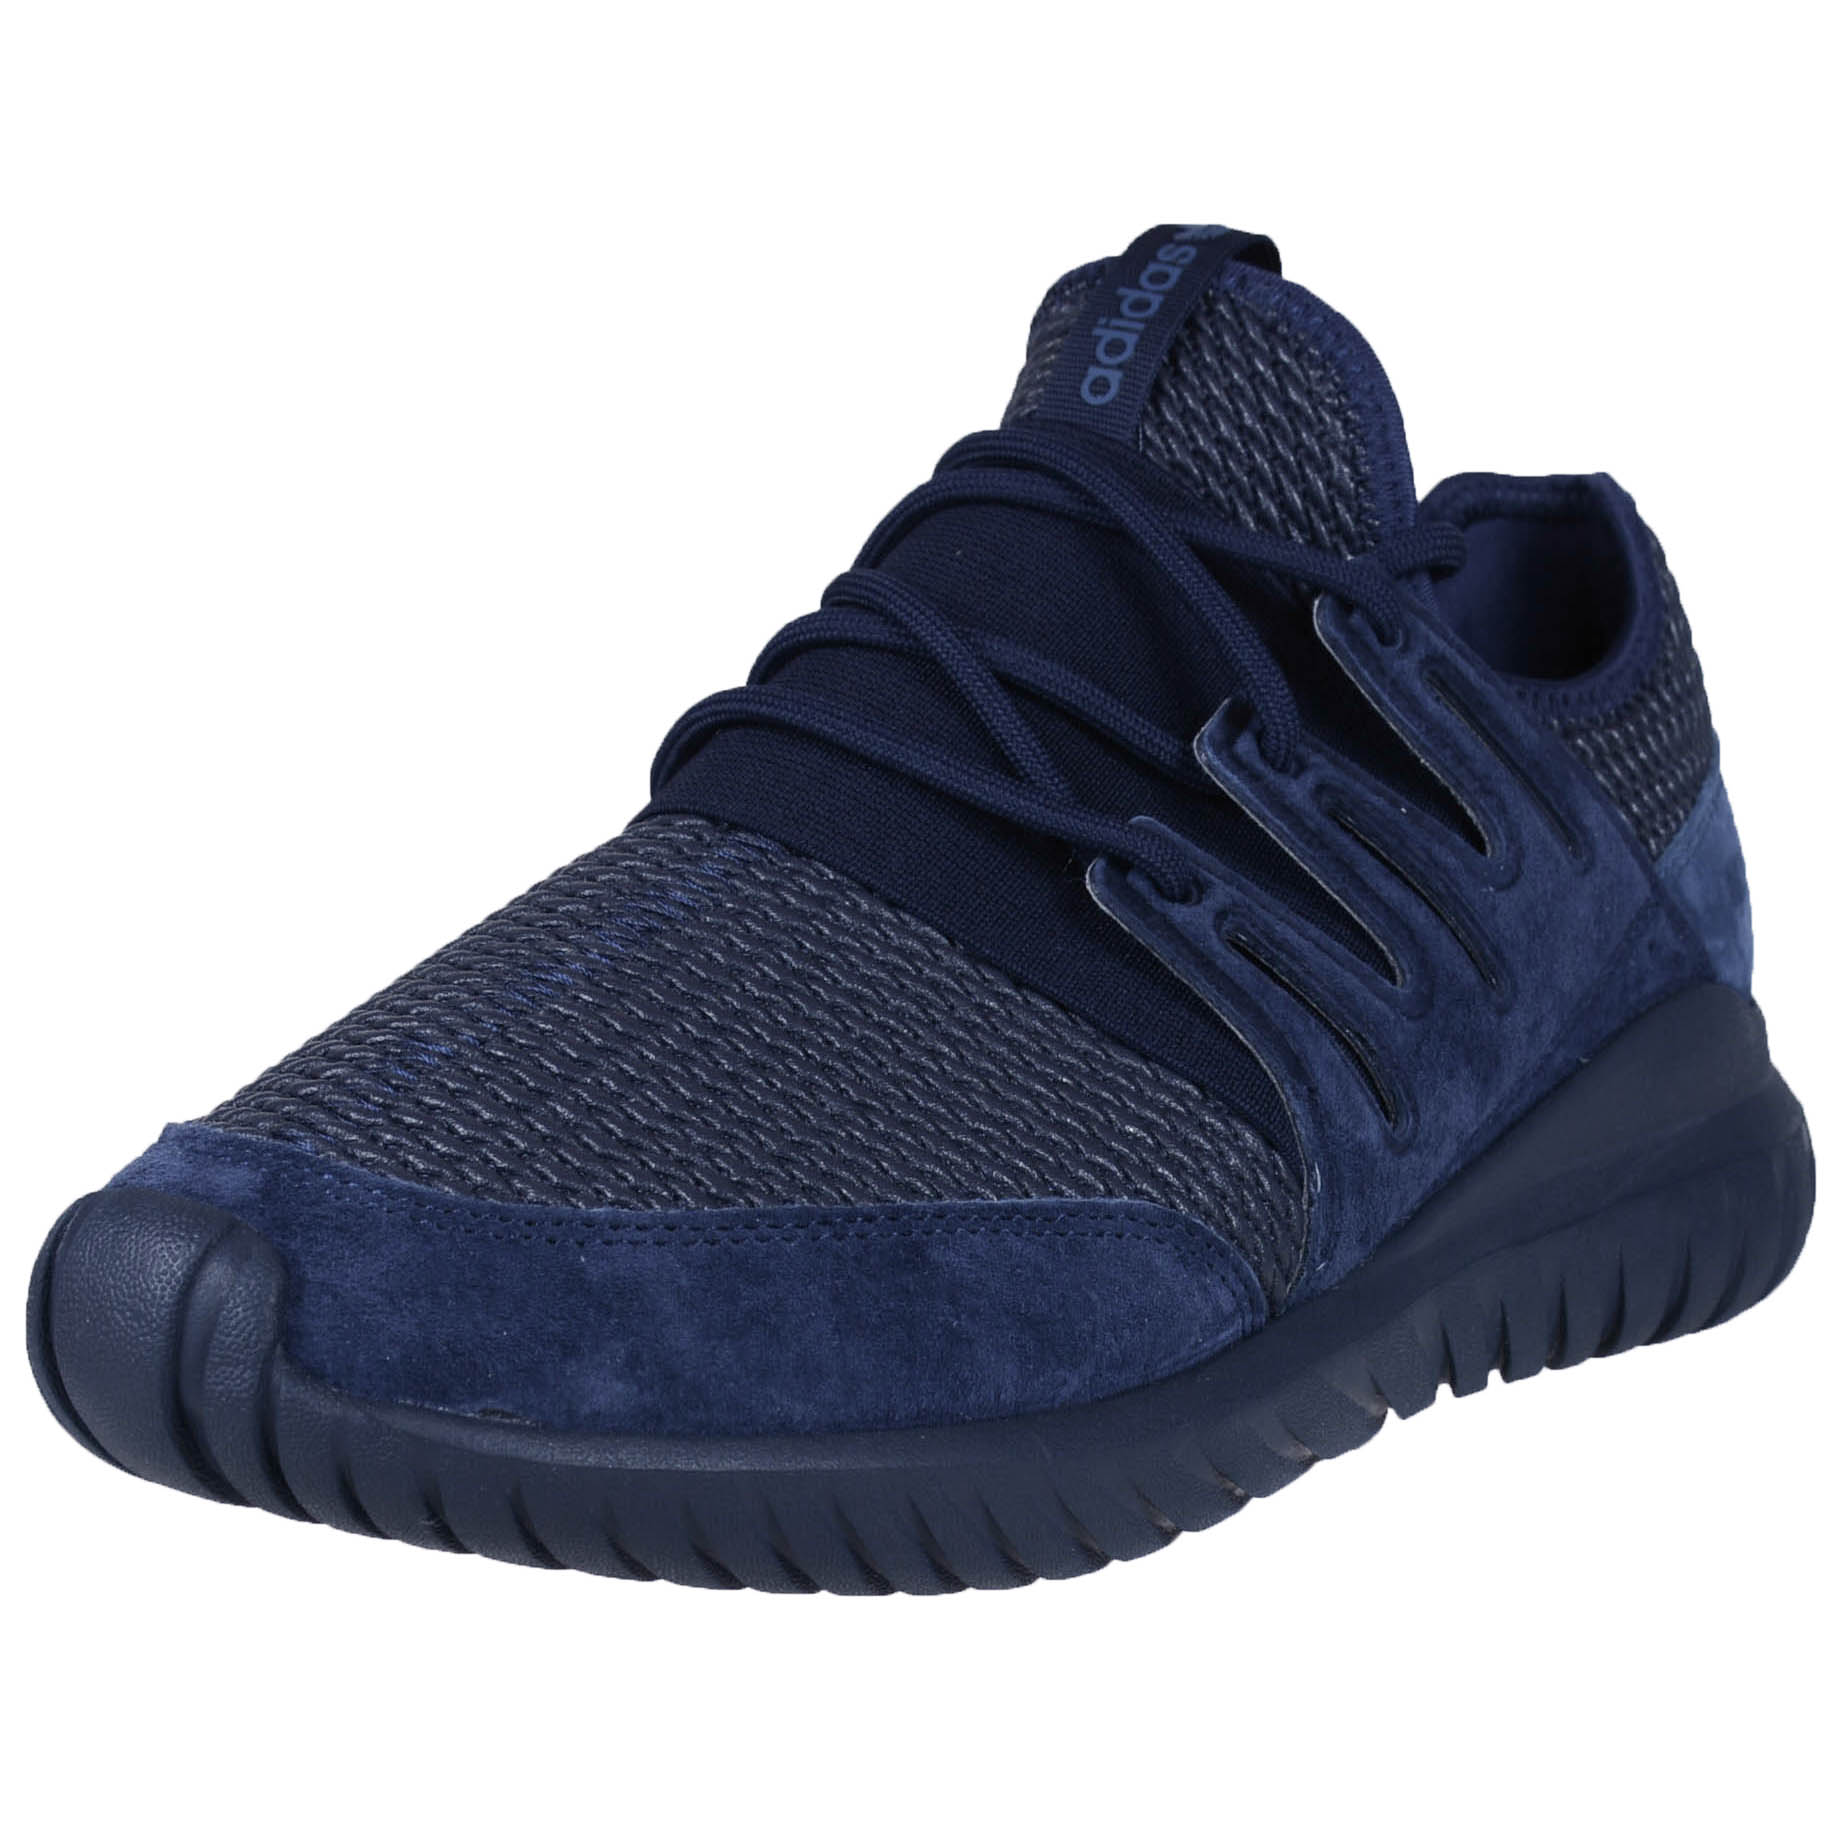 men's adidas tubular radial casual shoes black nz